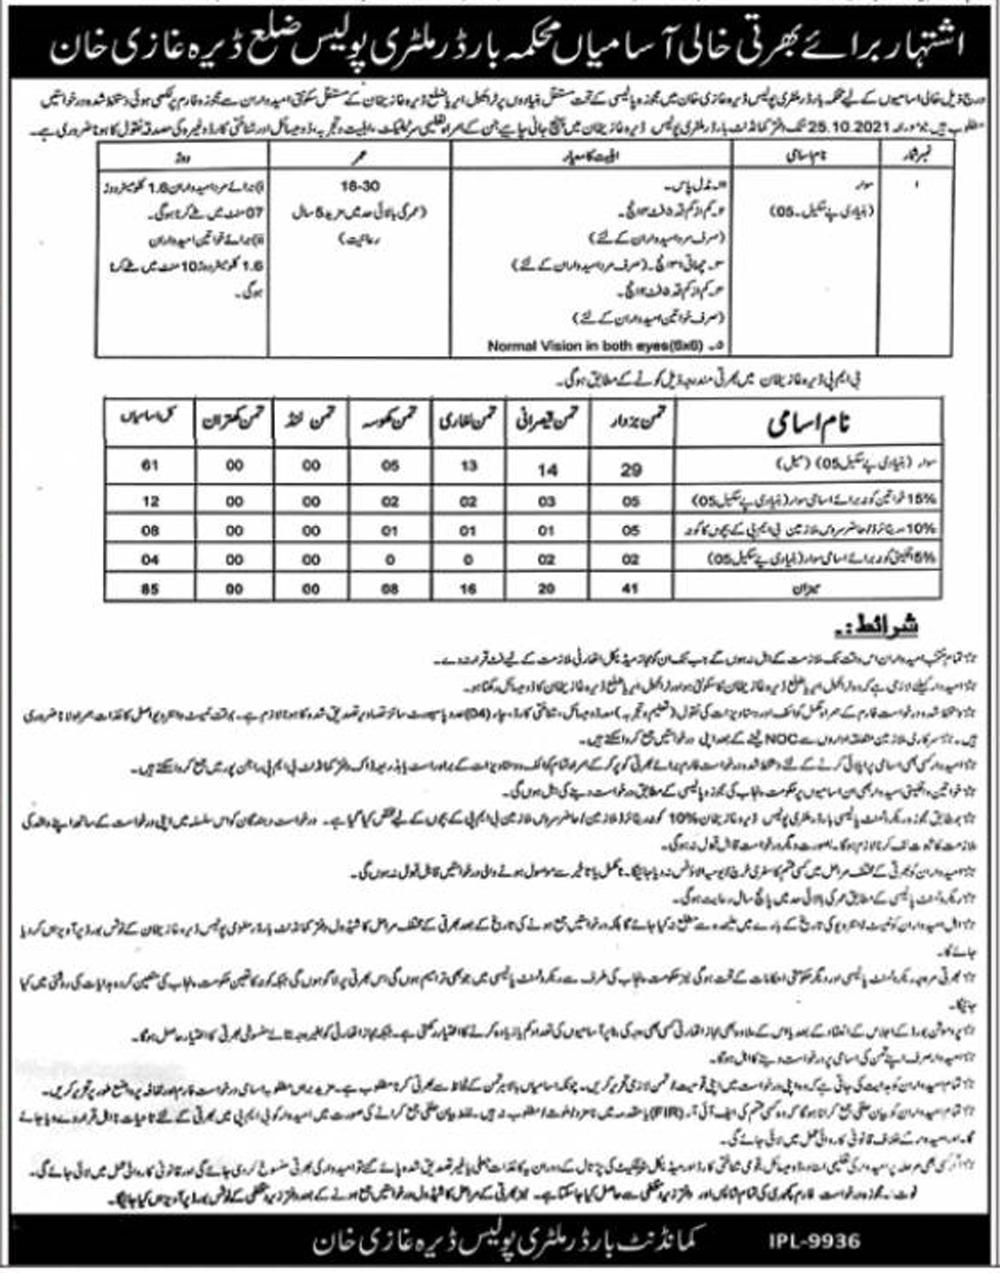 Border Military Police Jobs 2021 || Police Jobs in Pakistan 2021 || New Border Military Police Jobs